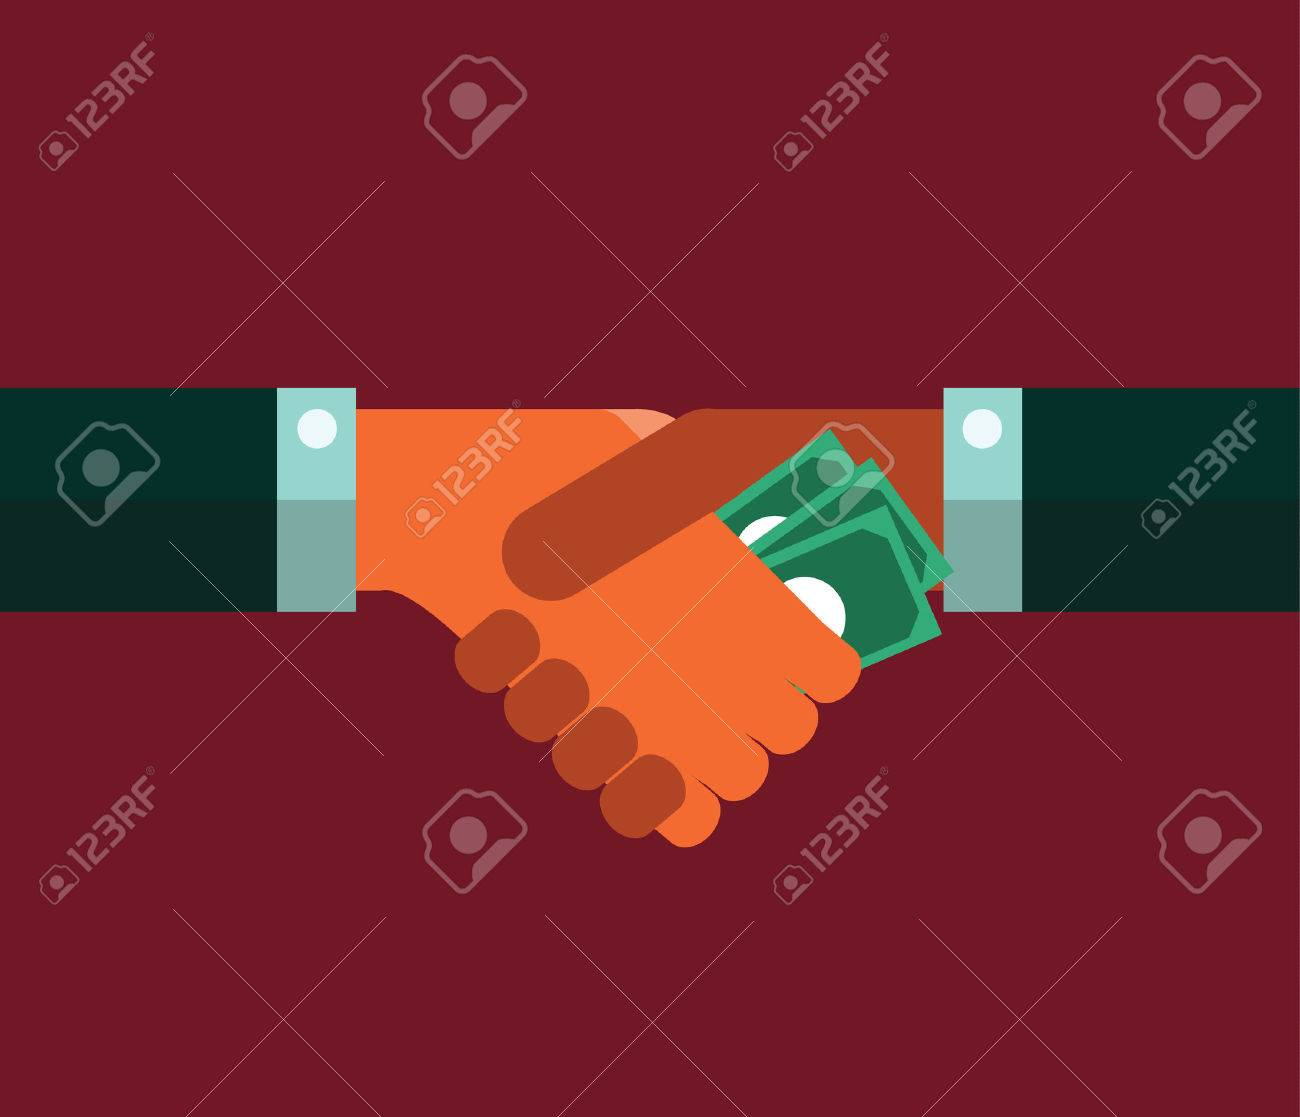 Businessman giving a bribe. Corruption concept. flat design. vector illustration - 31280610